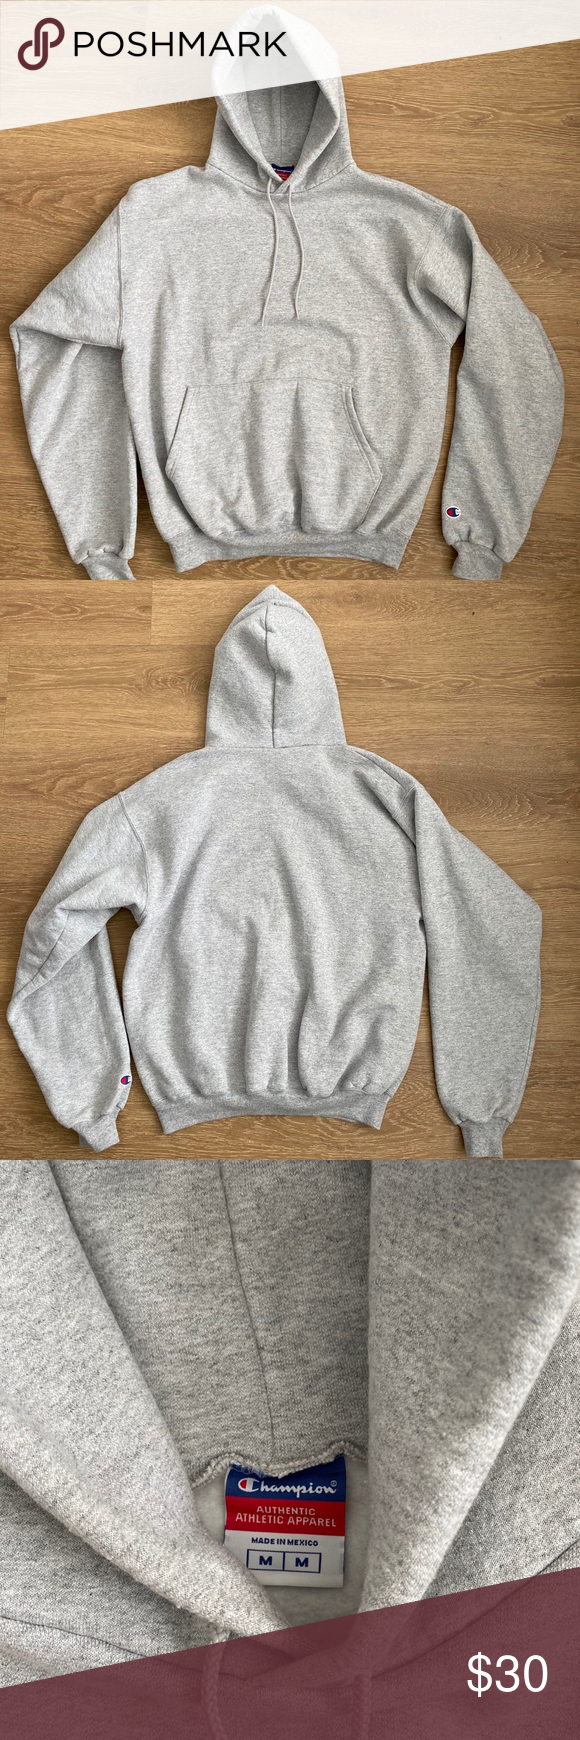 Champion grey hoodie Grey champion hoodie. Super soft and comfortable!! Champion Tops Sweatshirts & Hoodies #championhoodie